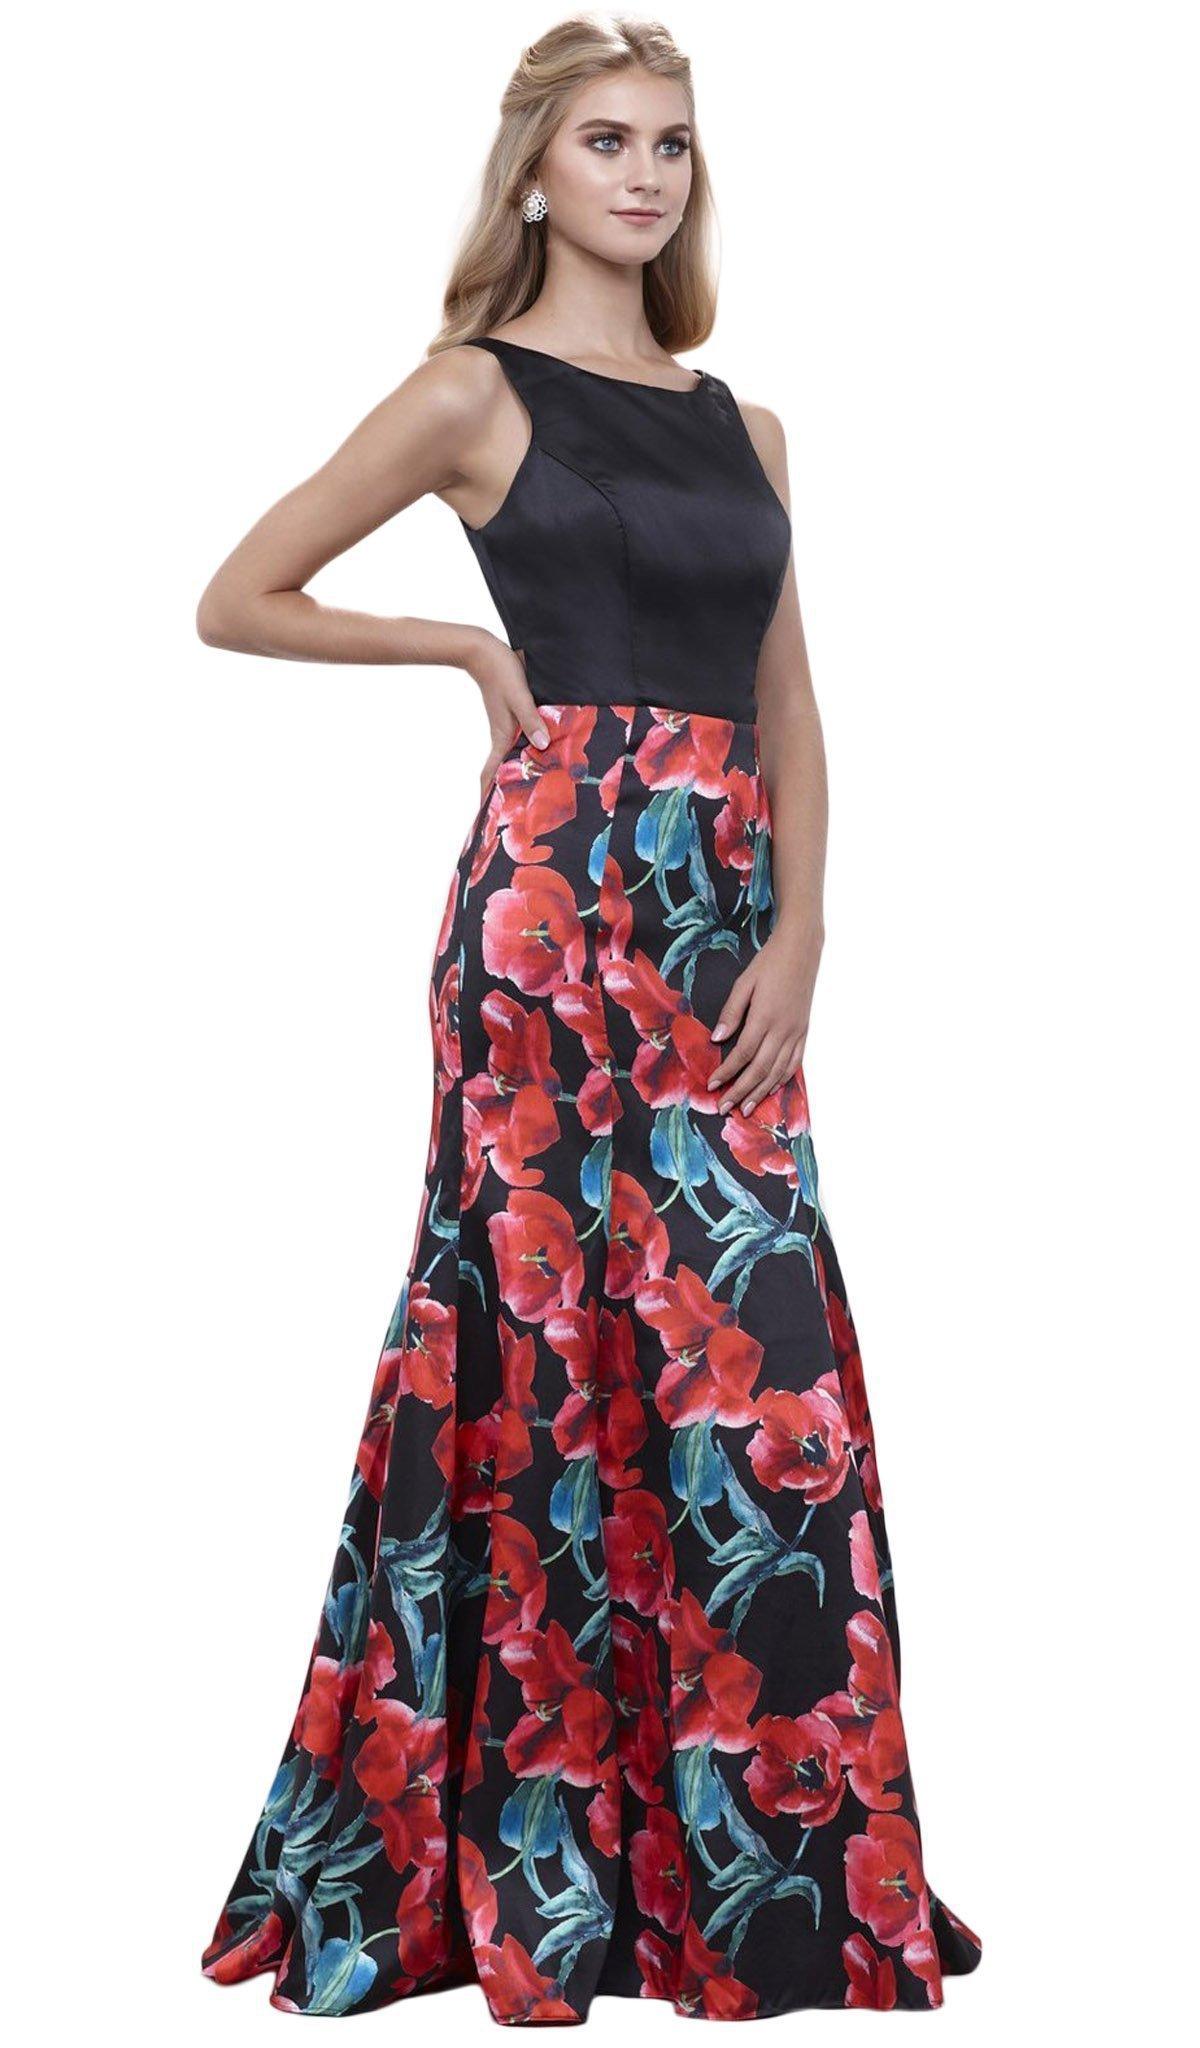 Nox Anabel - 8354 Sleeveless Floral Print Trumpet Evening Dress